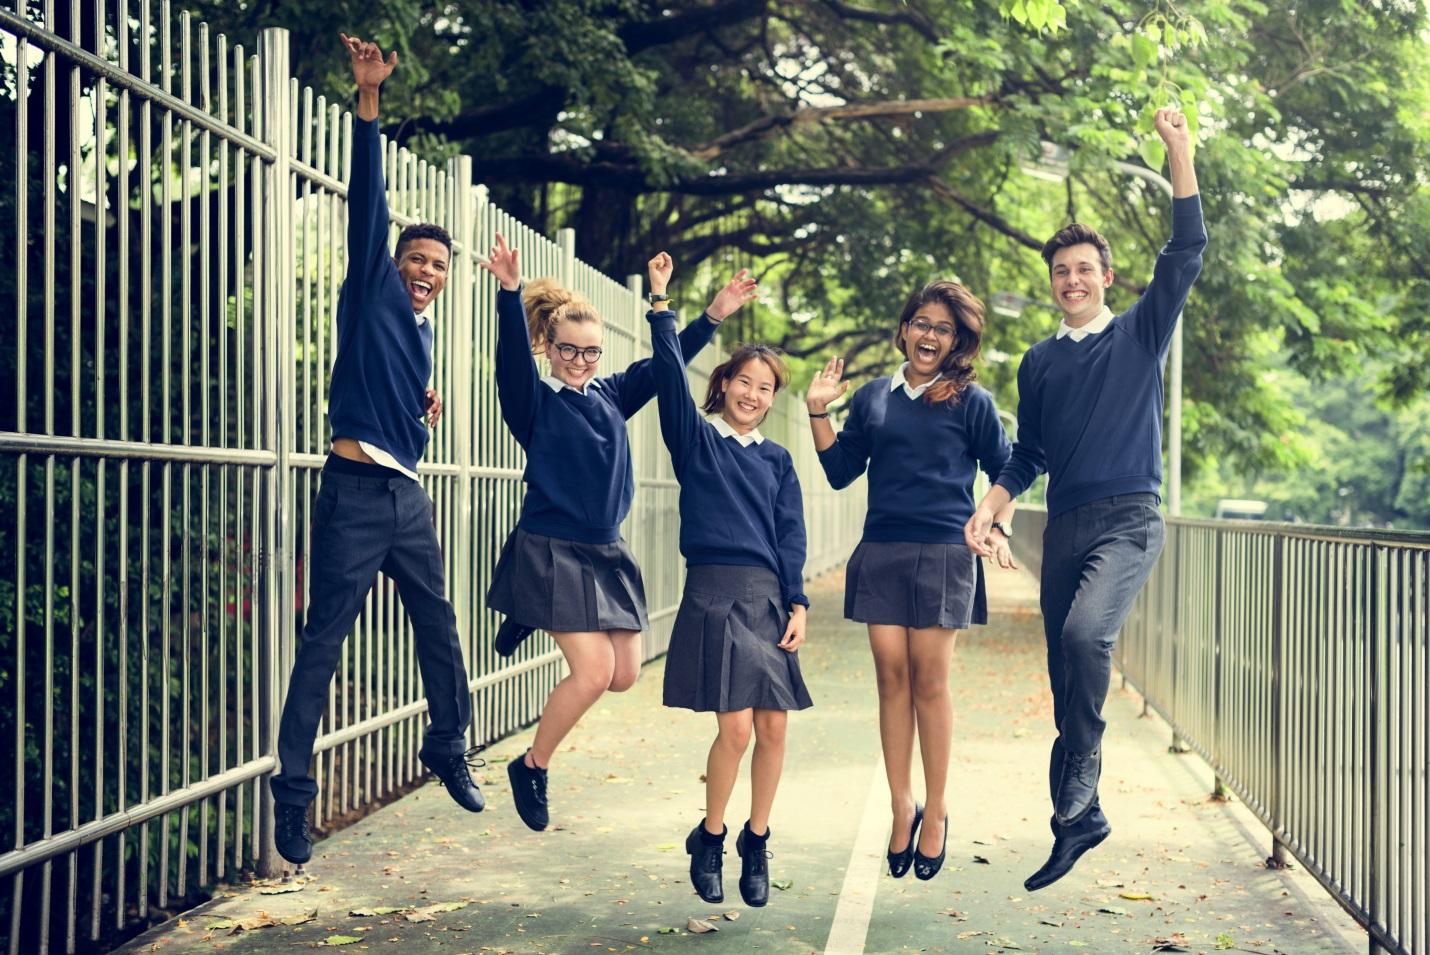 5 Pengalaman Lucu di Sekolah yang Akan Selalu Kamu Kenang